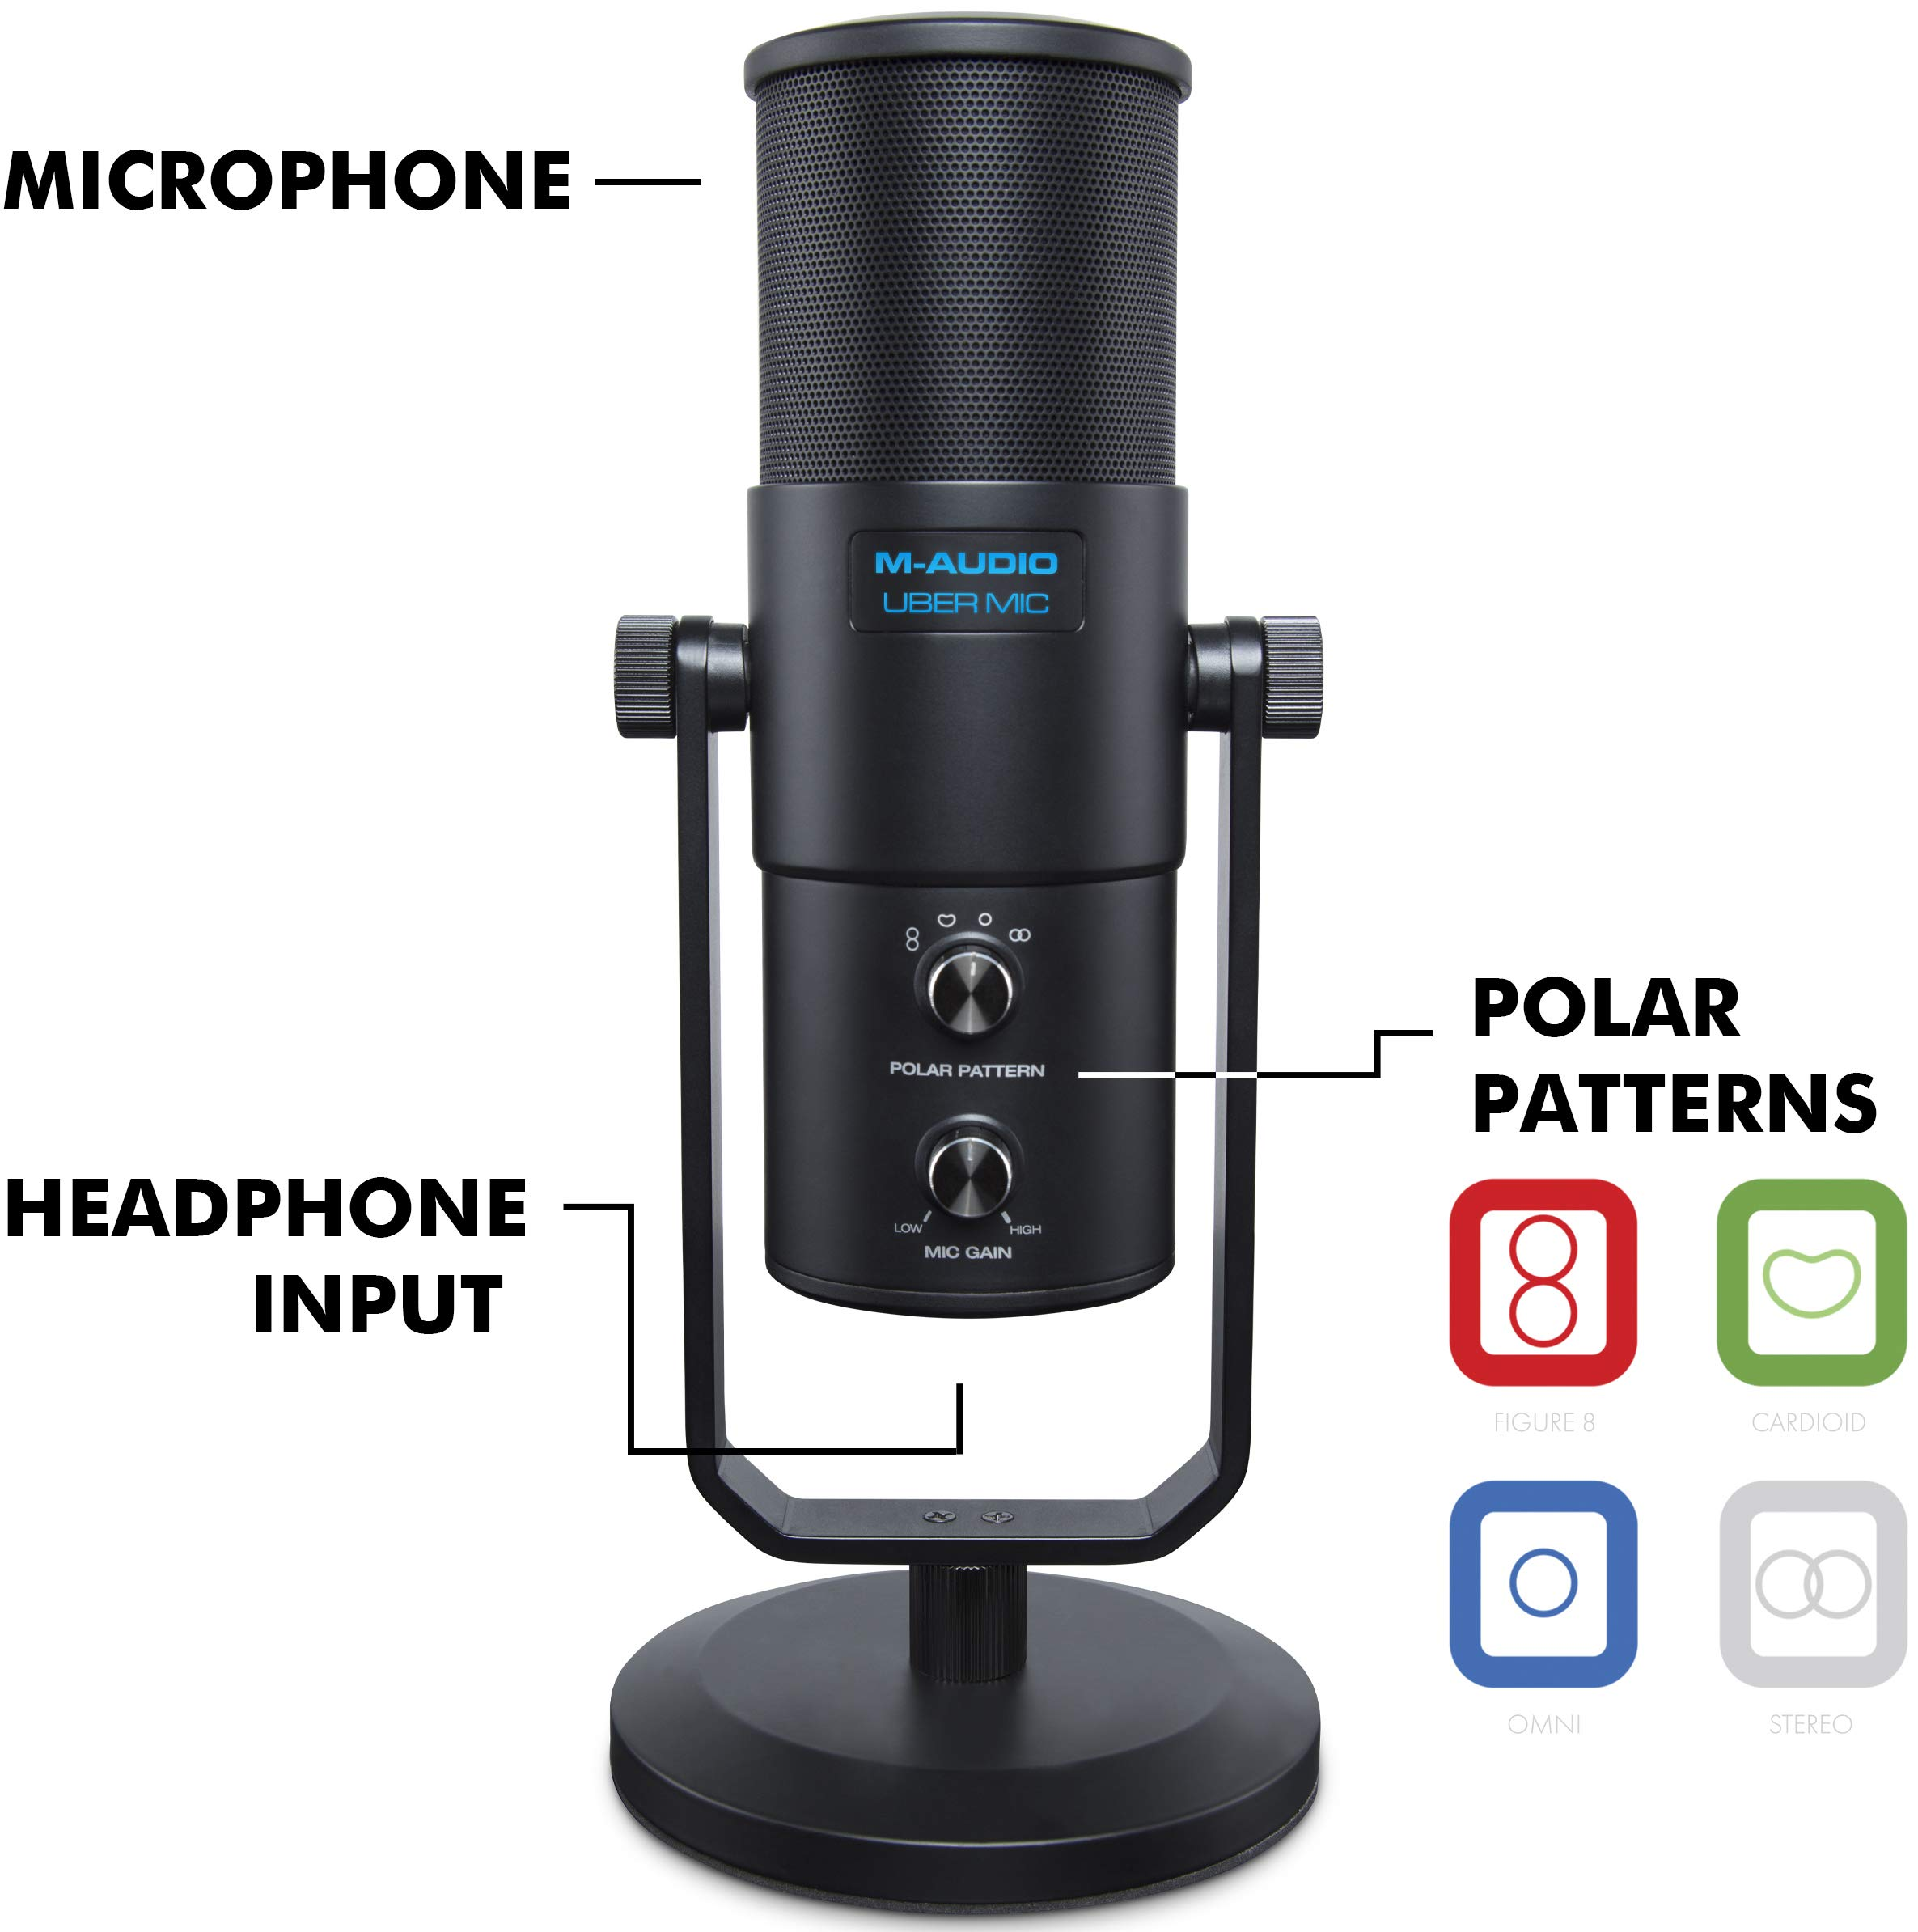 polar pattern microphone free patterns. Black Bedroom Furniture Sets. Home Design Ideas